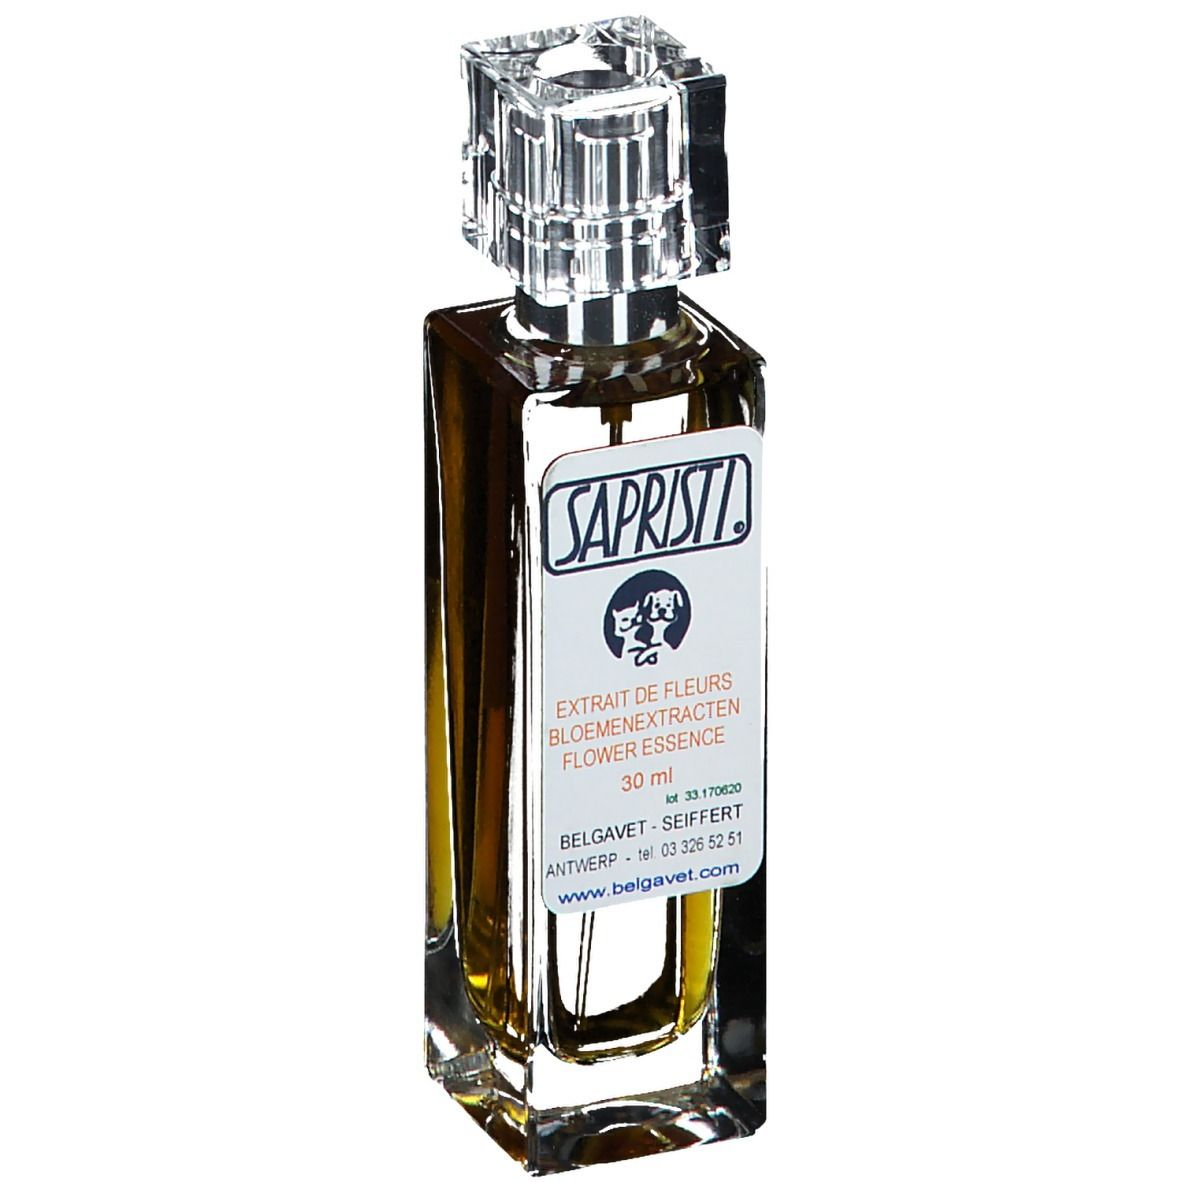 Image of Sapsristi® Blüten-Essenz Parfum